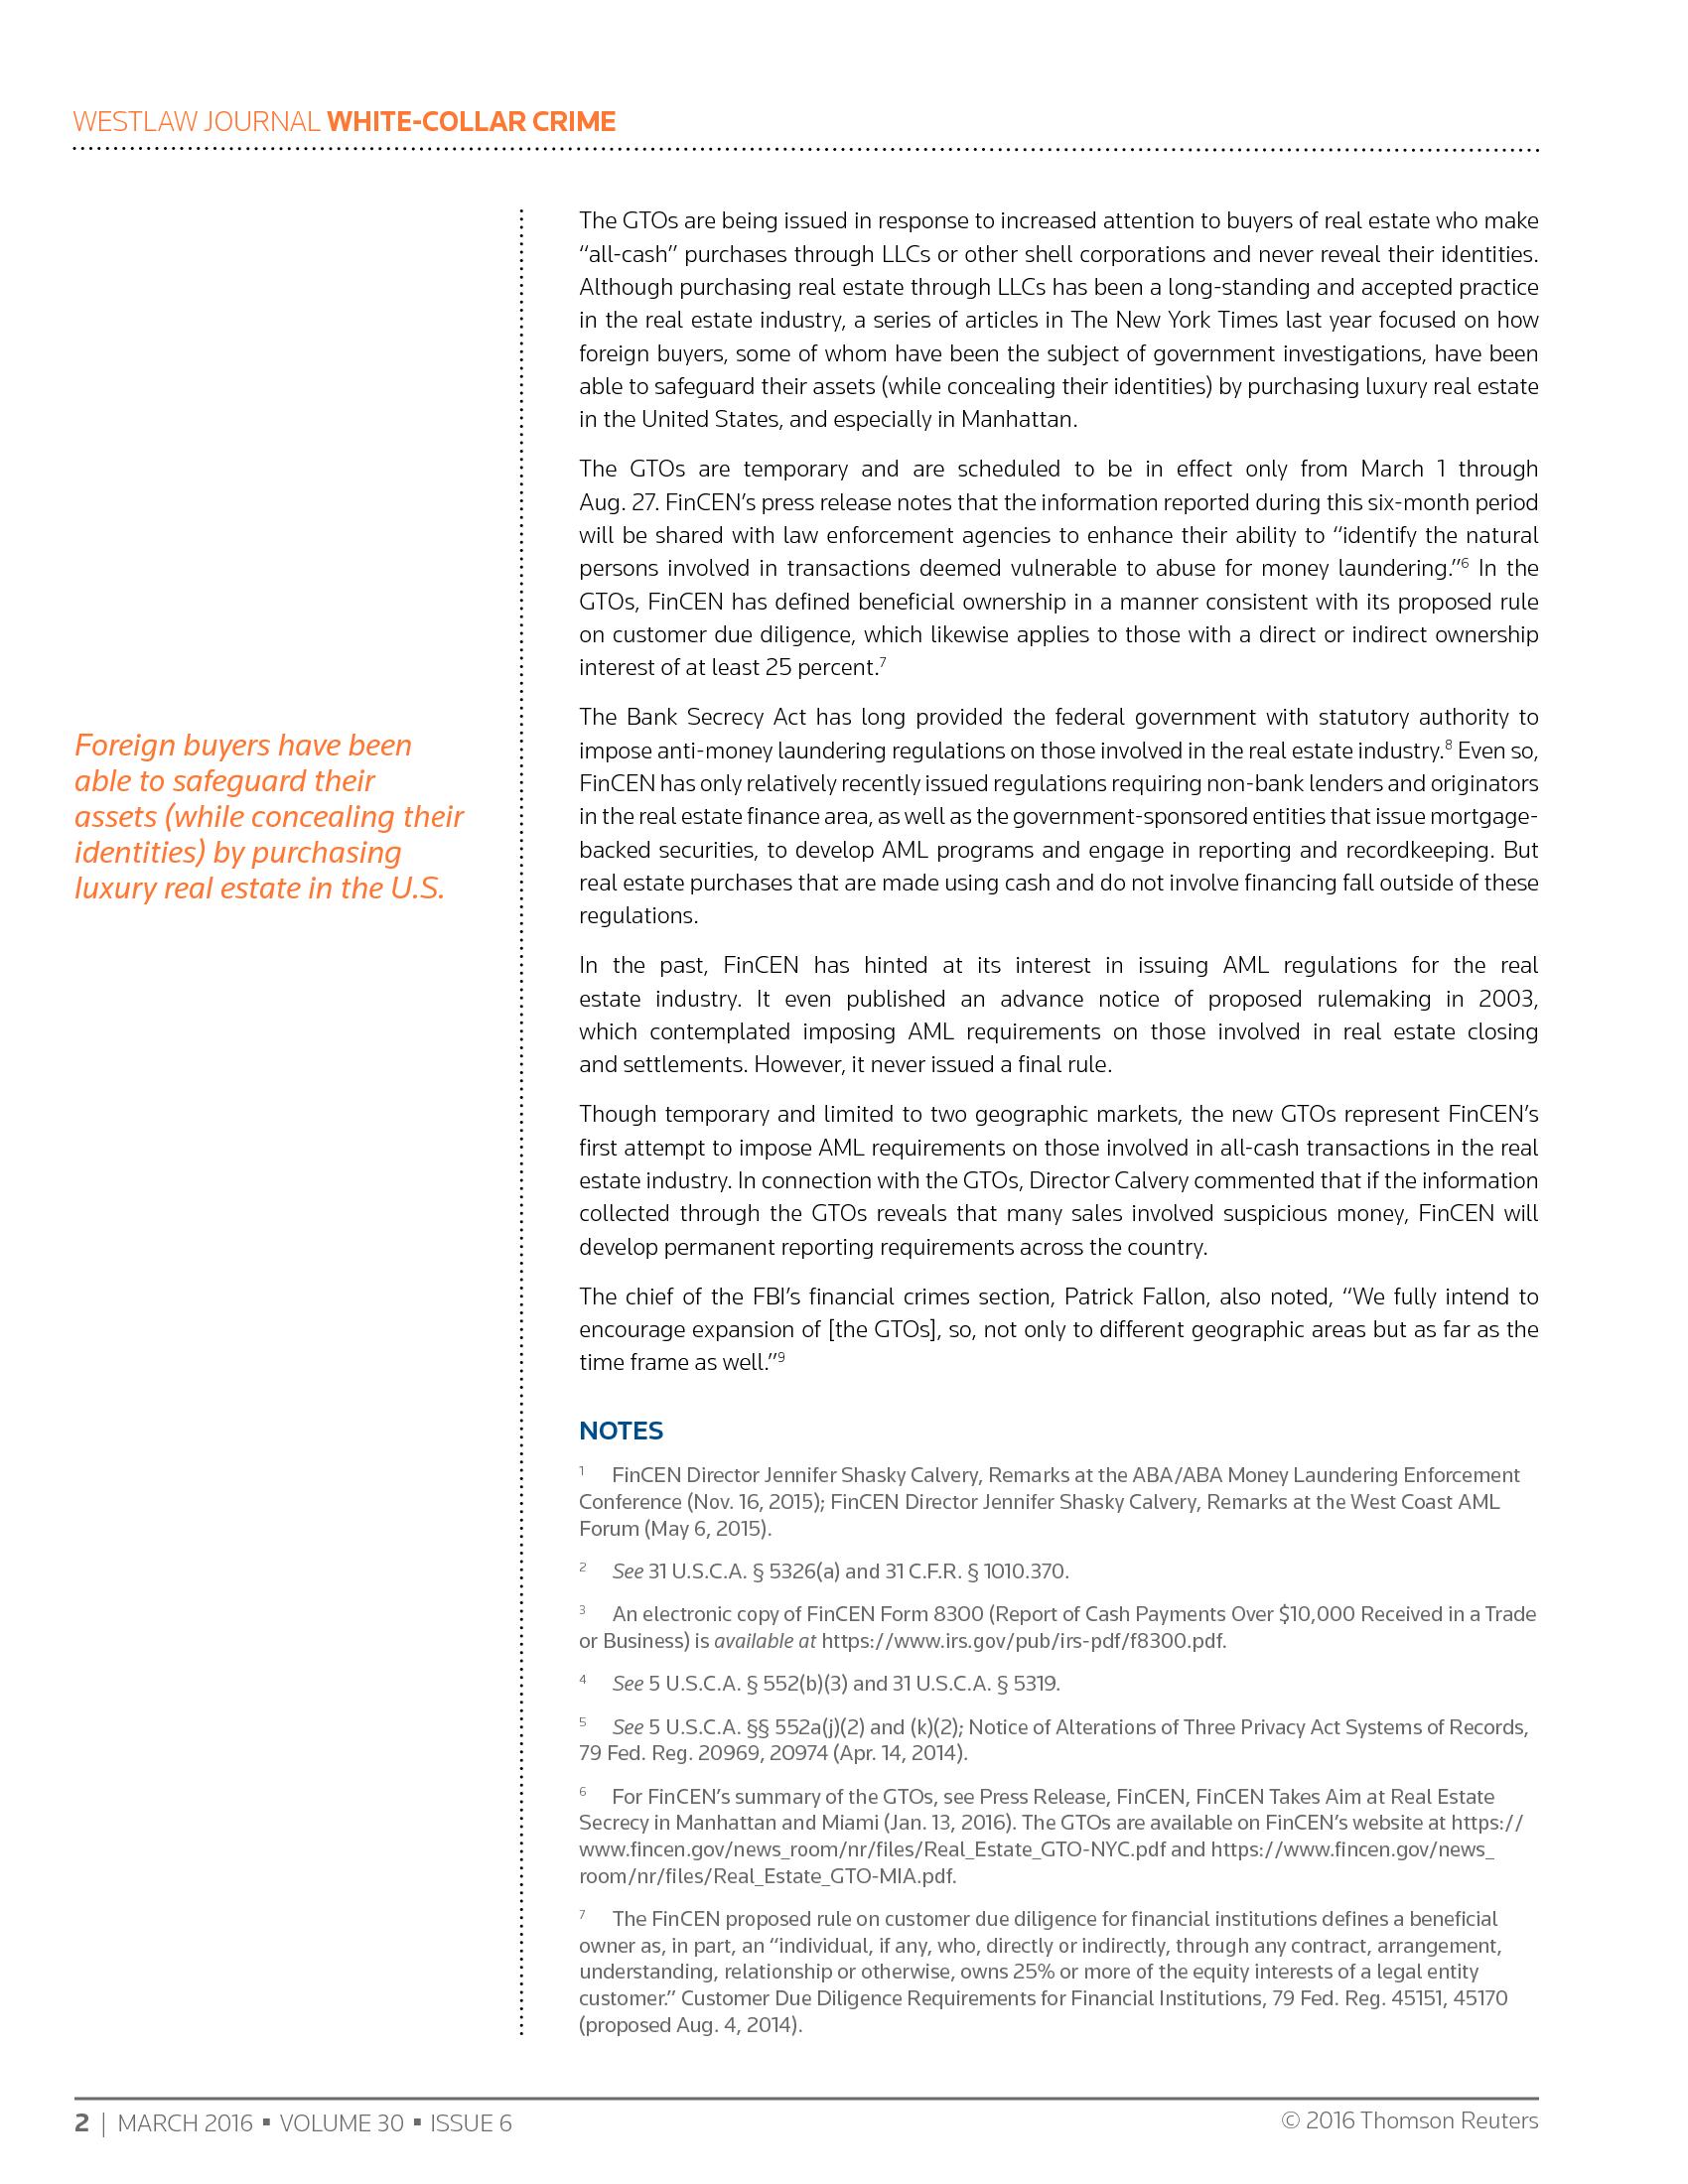 Advisorselect - New Anti-Money Laundering Regulatory Initiative ...